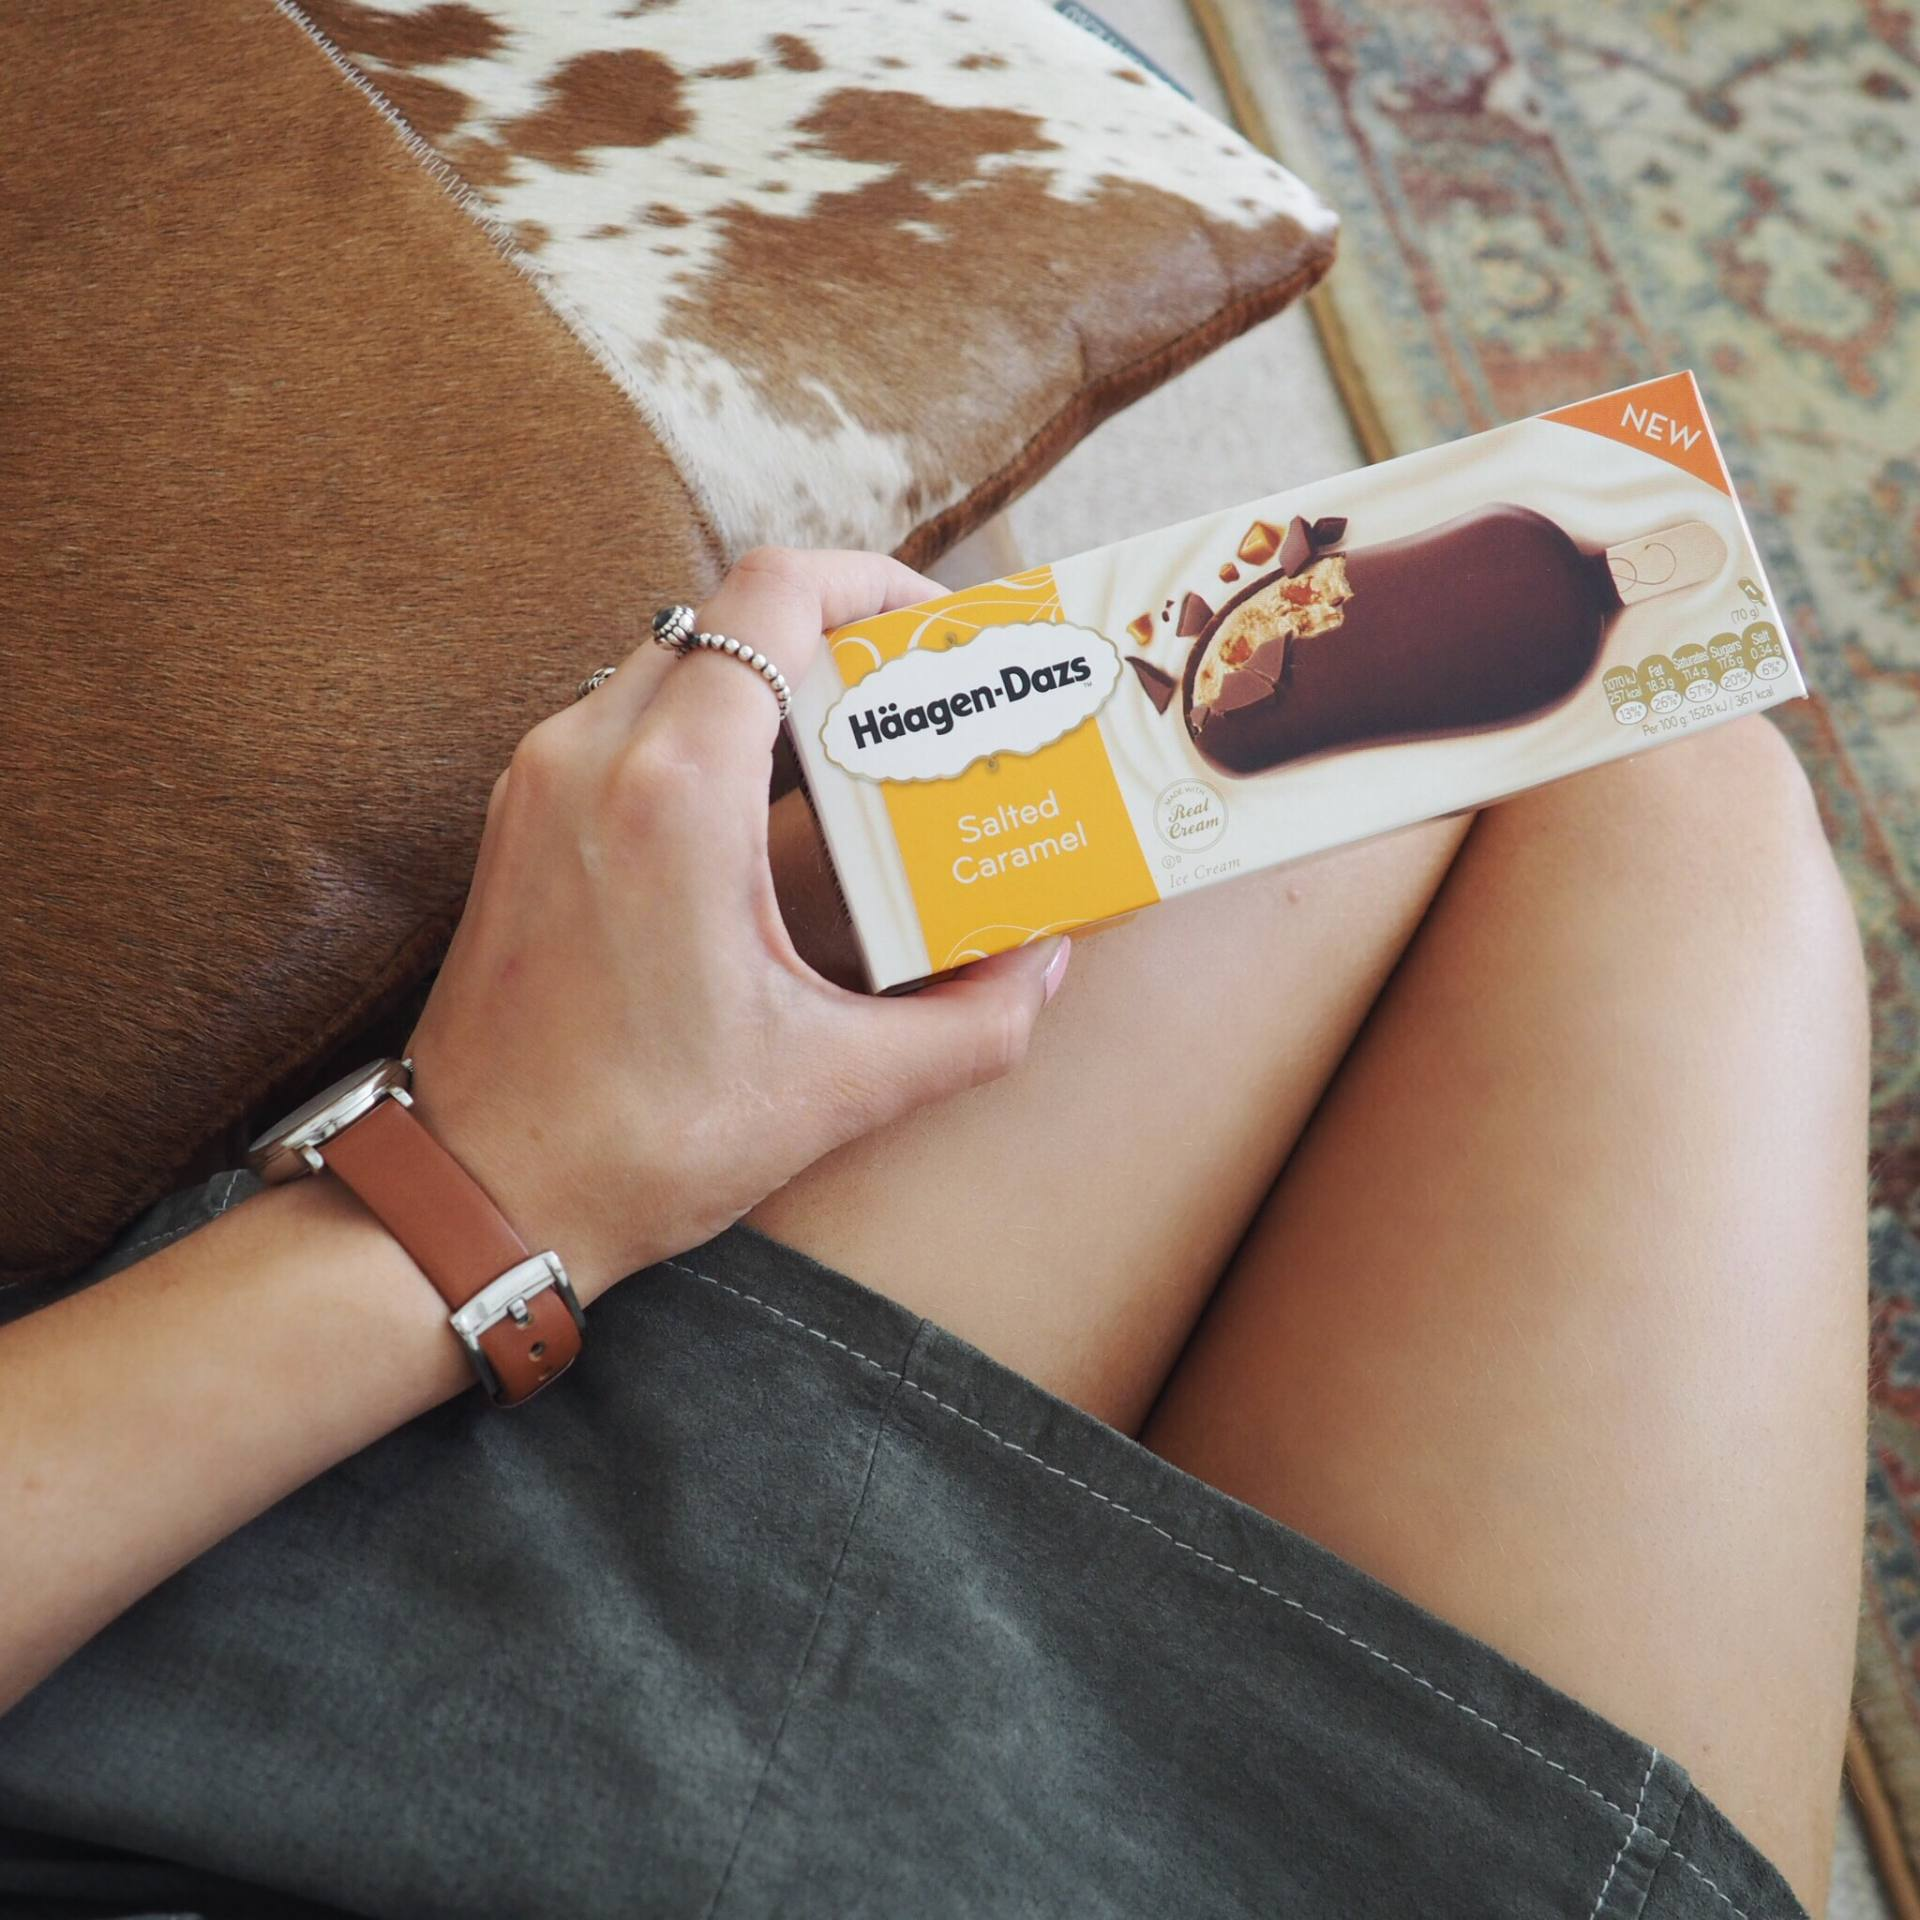 Häagen-Dazs salted caramel stick bar